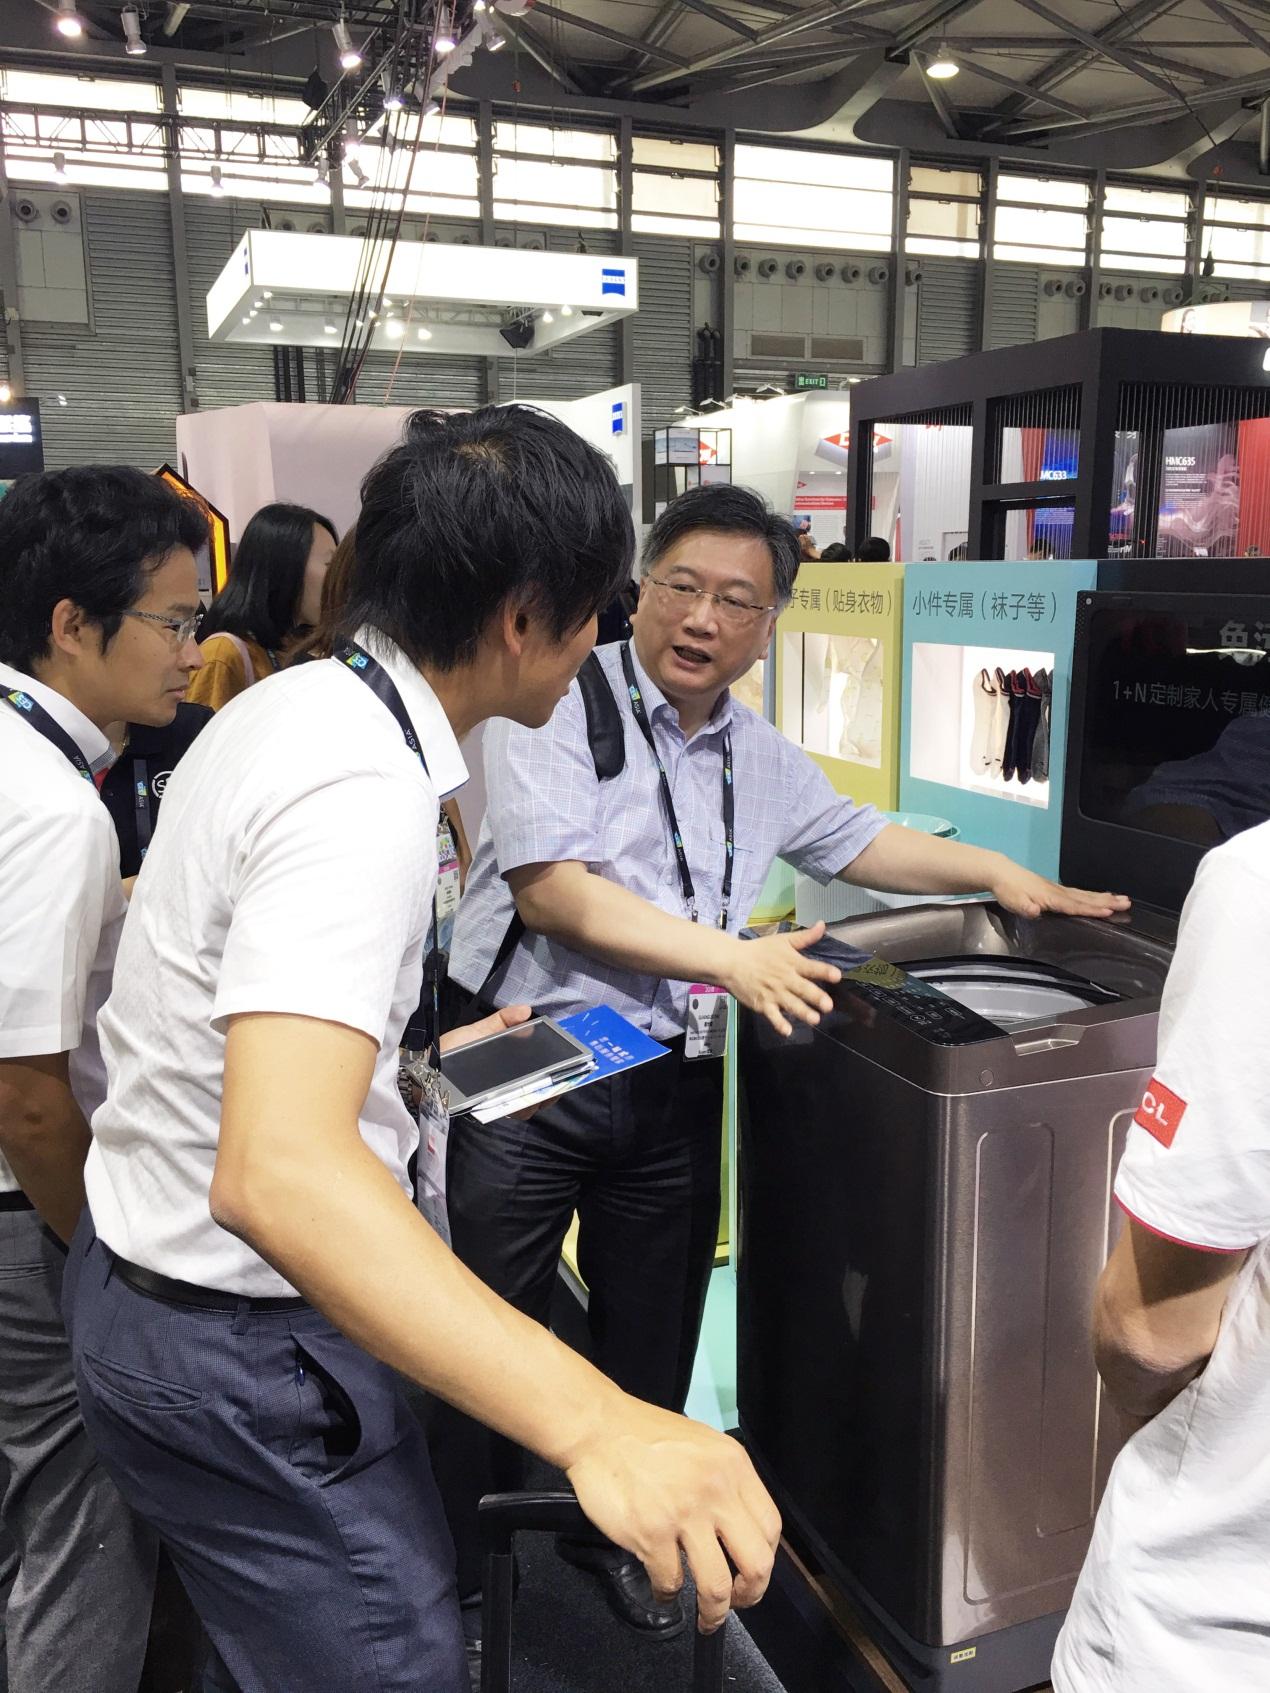 TCL冰箱洗衣机亮相CES Asia 2018  引领白家电发展新趋势